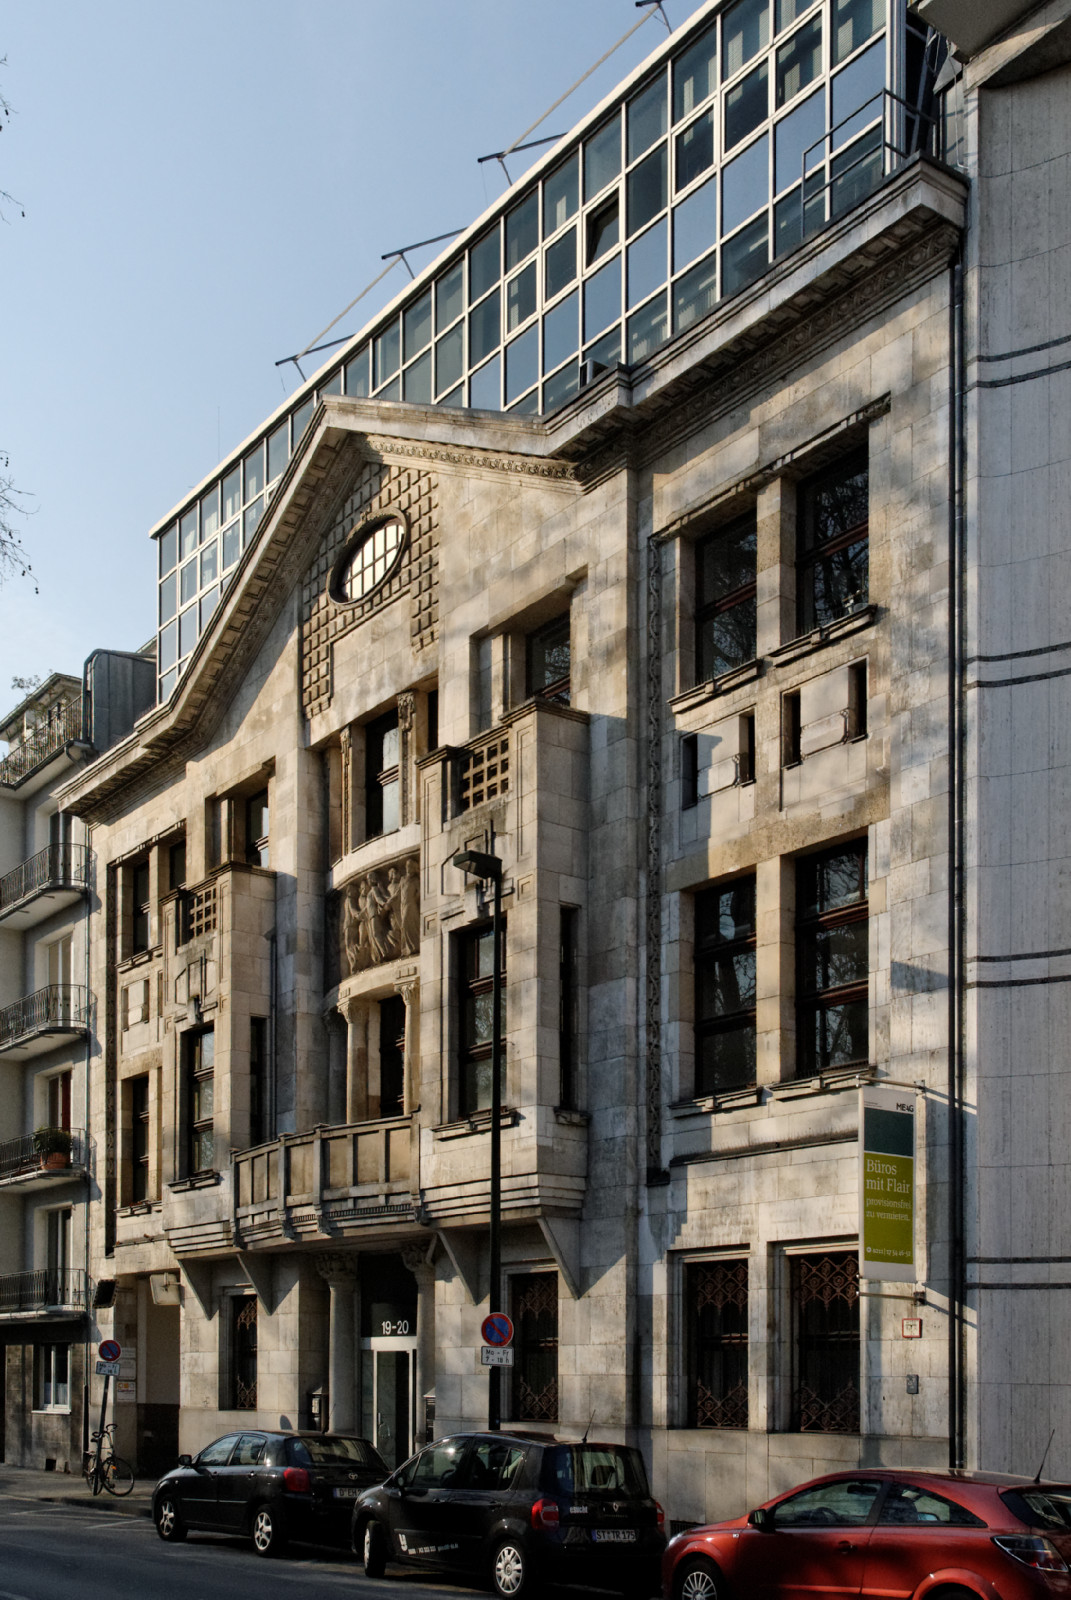 datei haus jaegerhofstrasse 20 in duesseldorf pempelfort von wikipedia. Black Bedroom Furniture Sets. Home Design Ideas